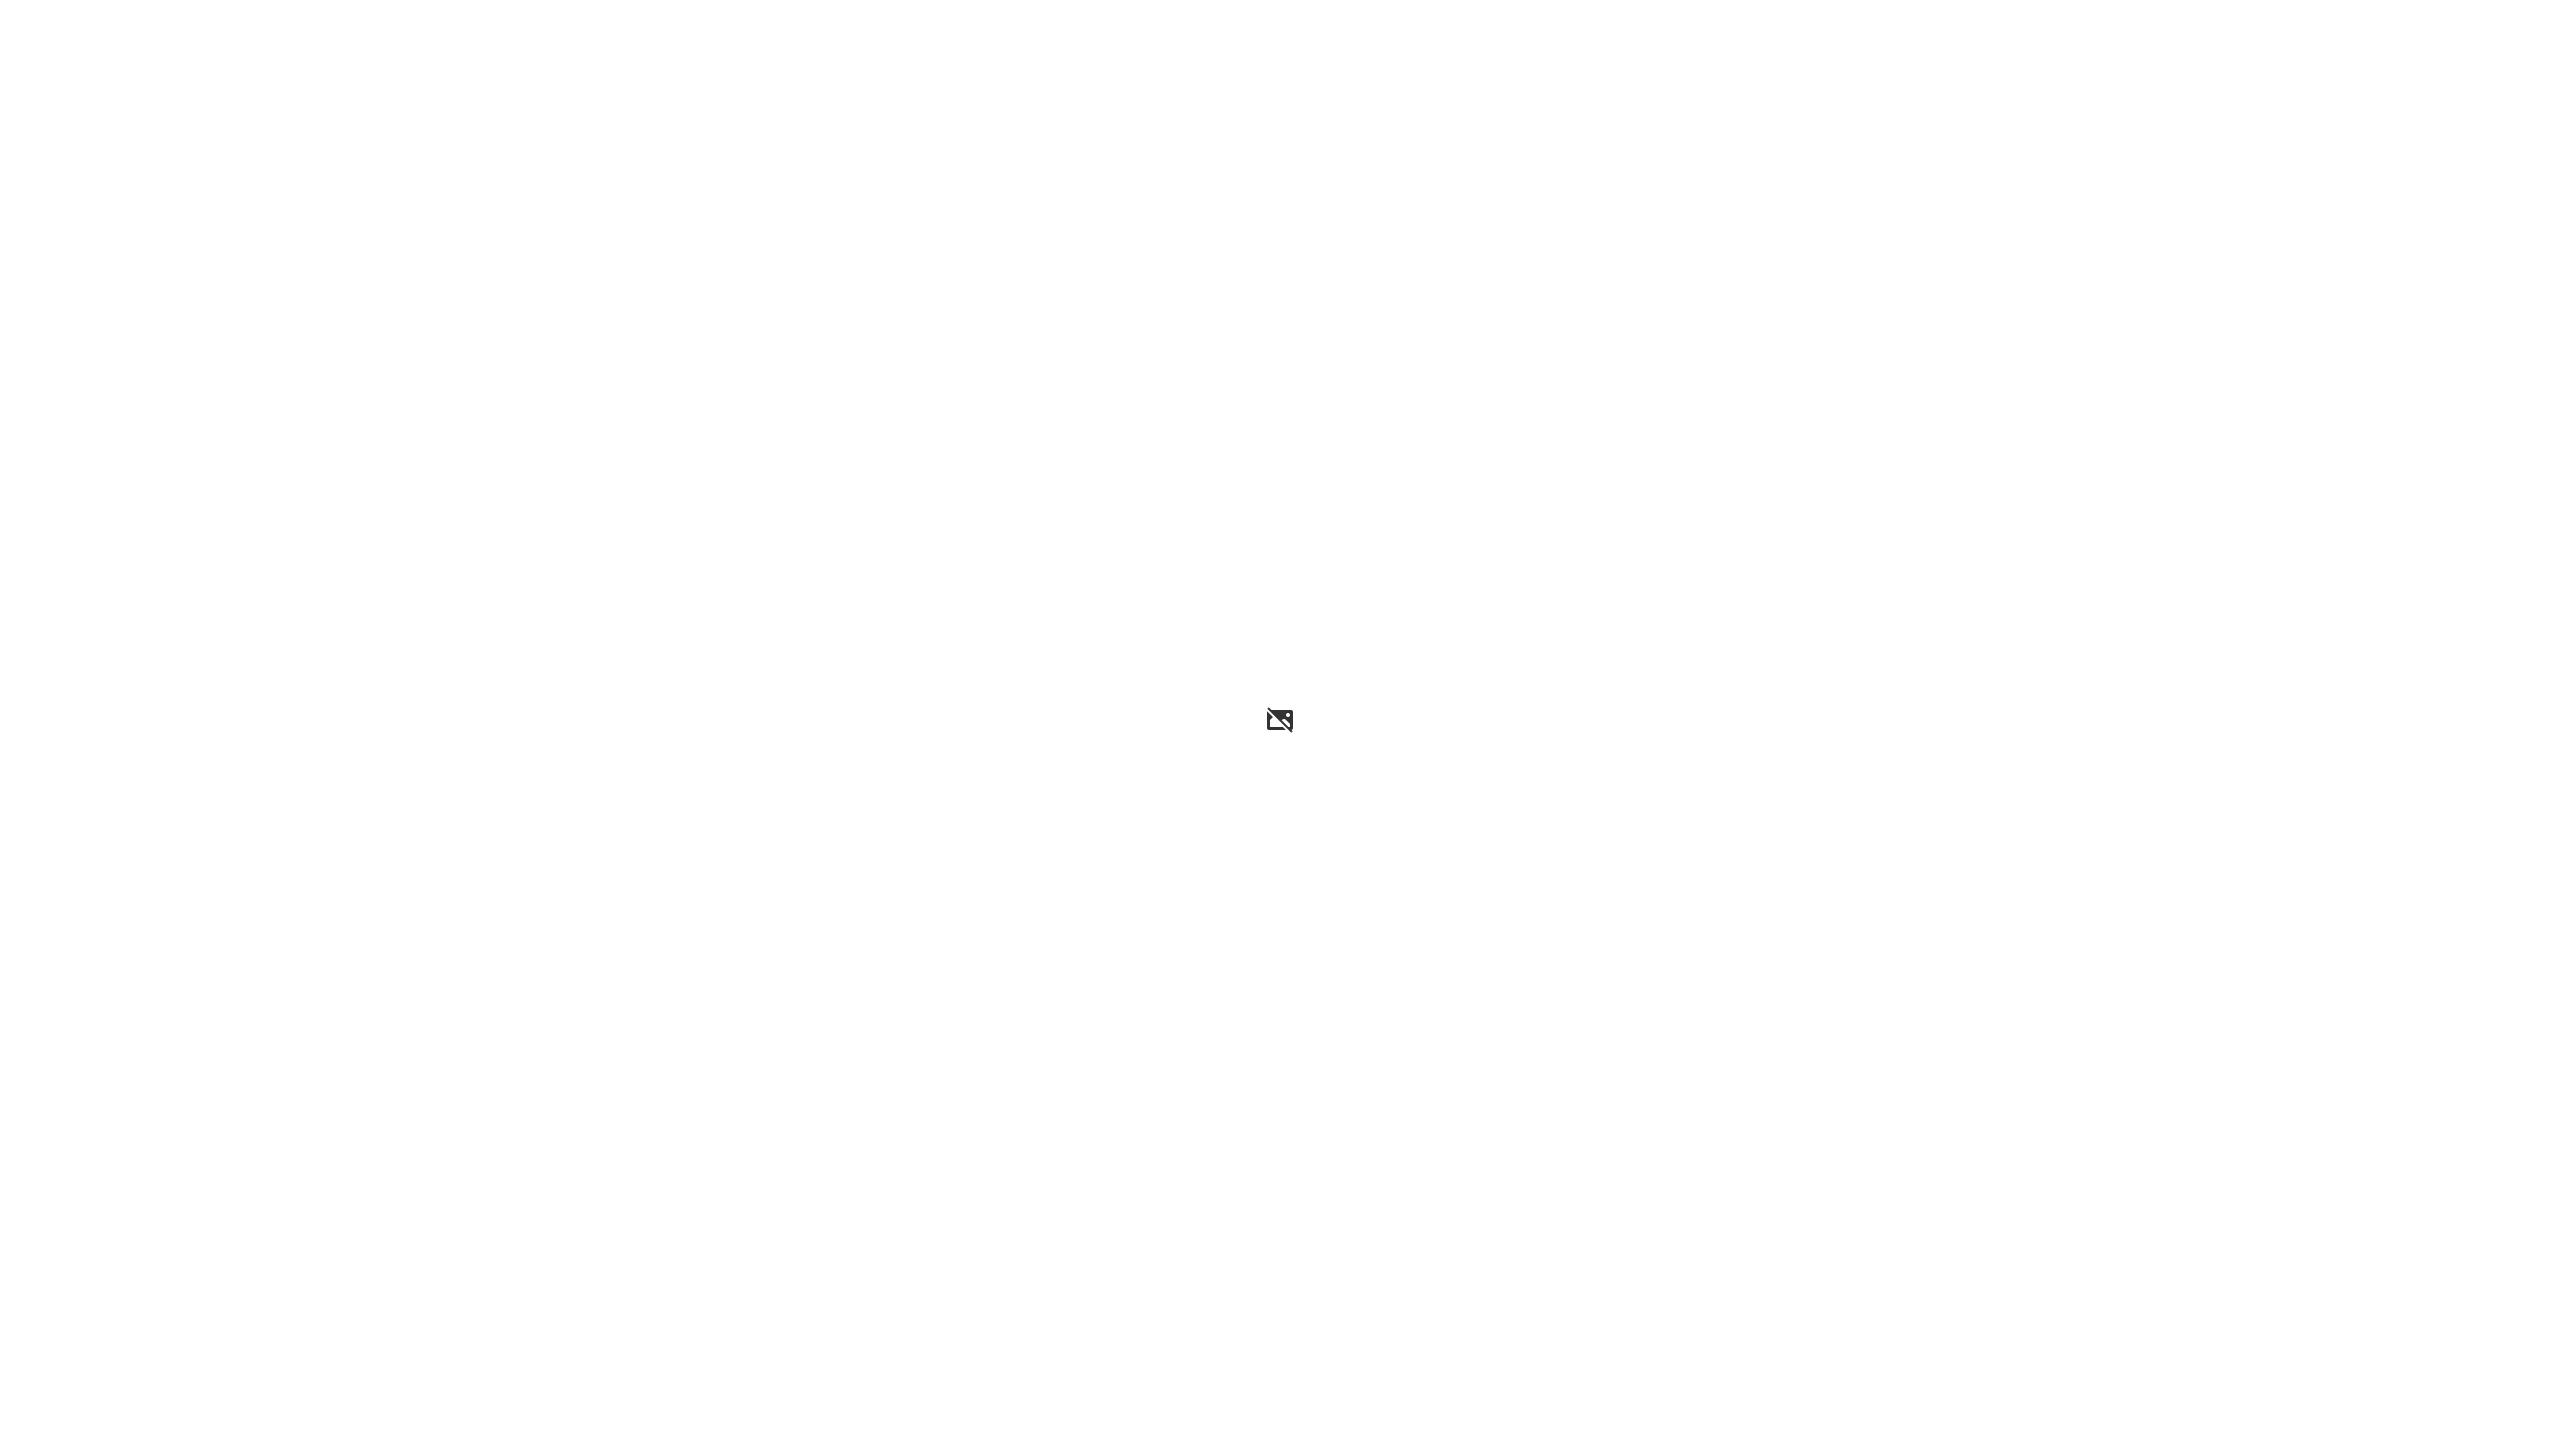 adc_wallpaper_dark__no_maestry__by_paulikaiser-d95knfc